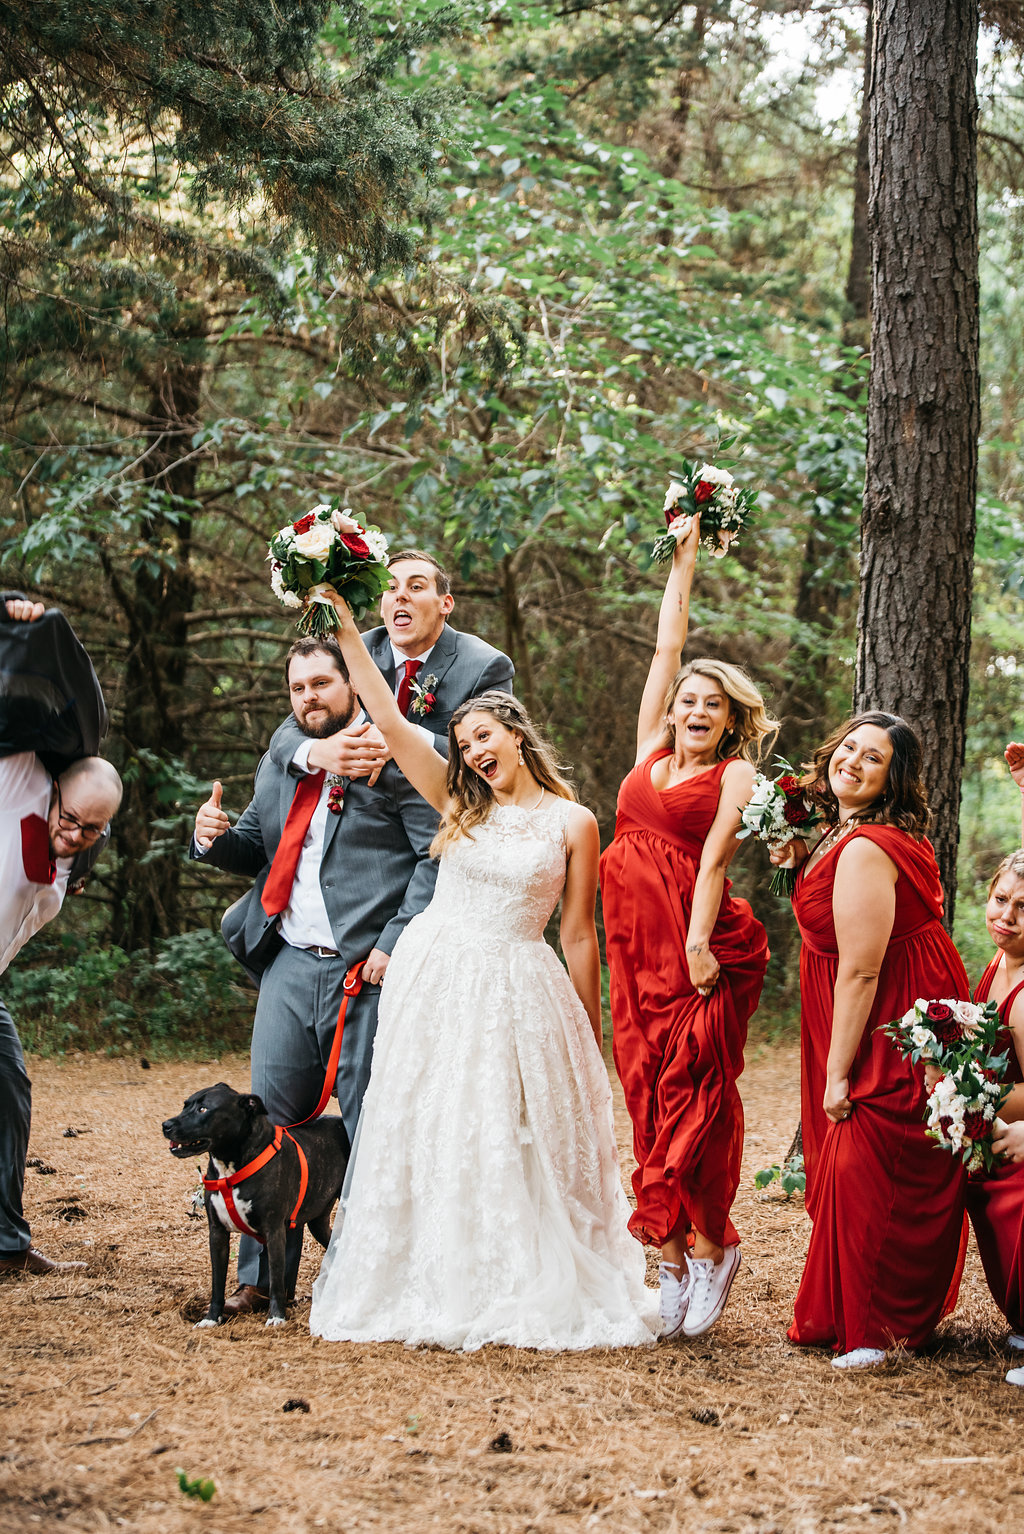 Lexi-Colby-Wedding-2701.jpg